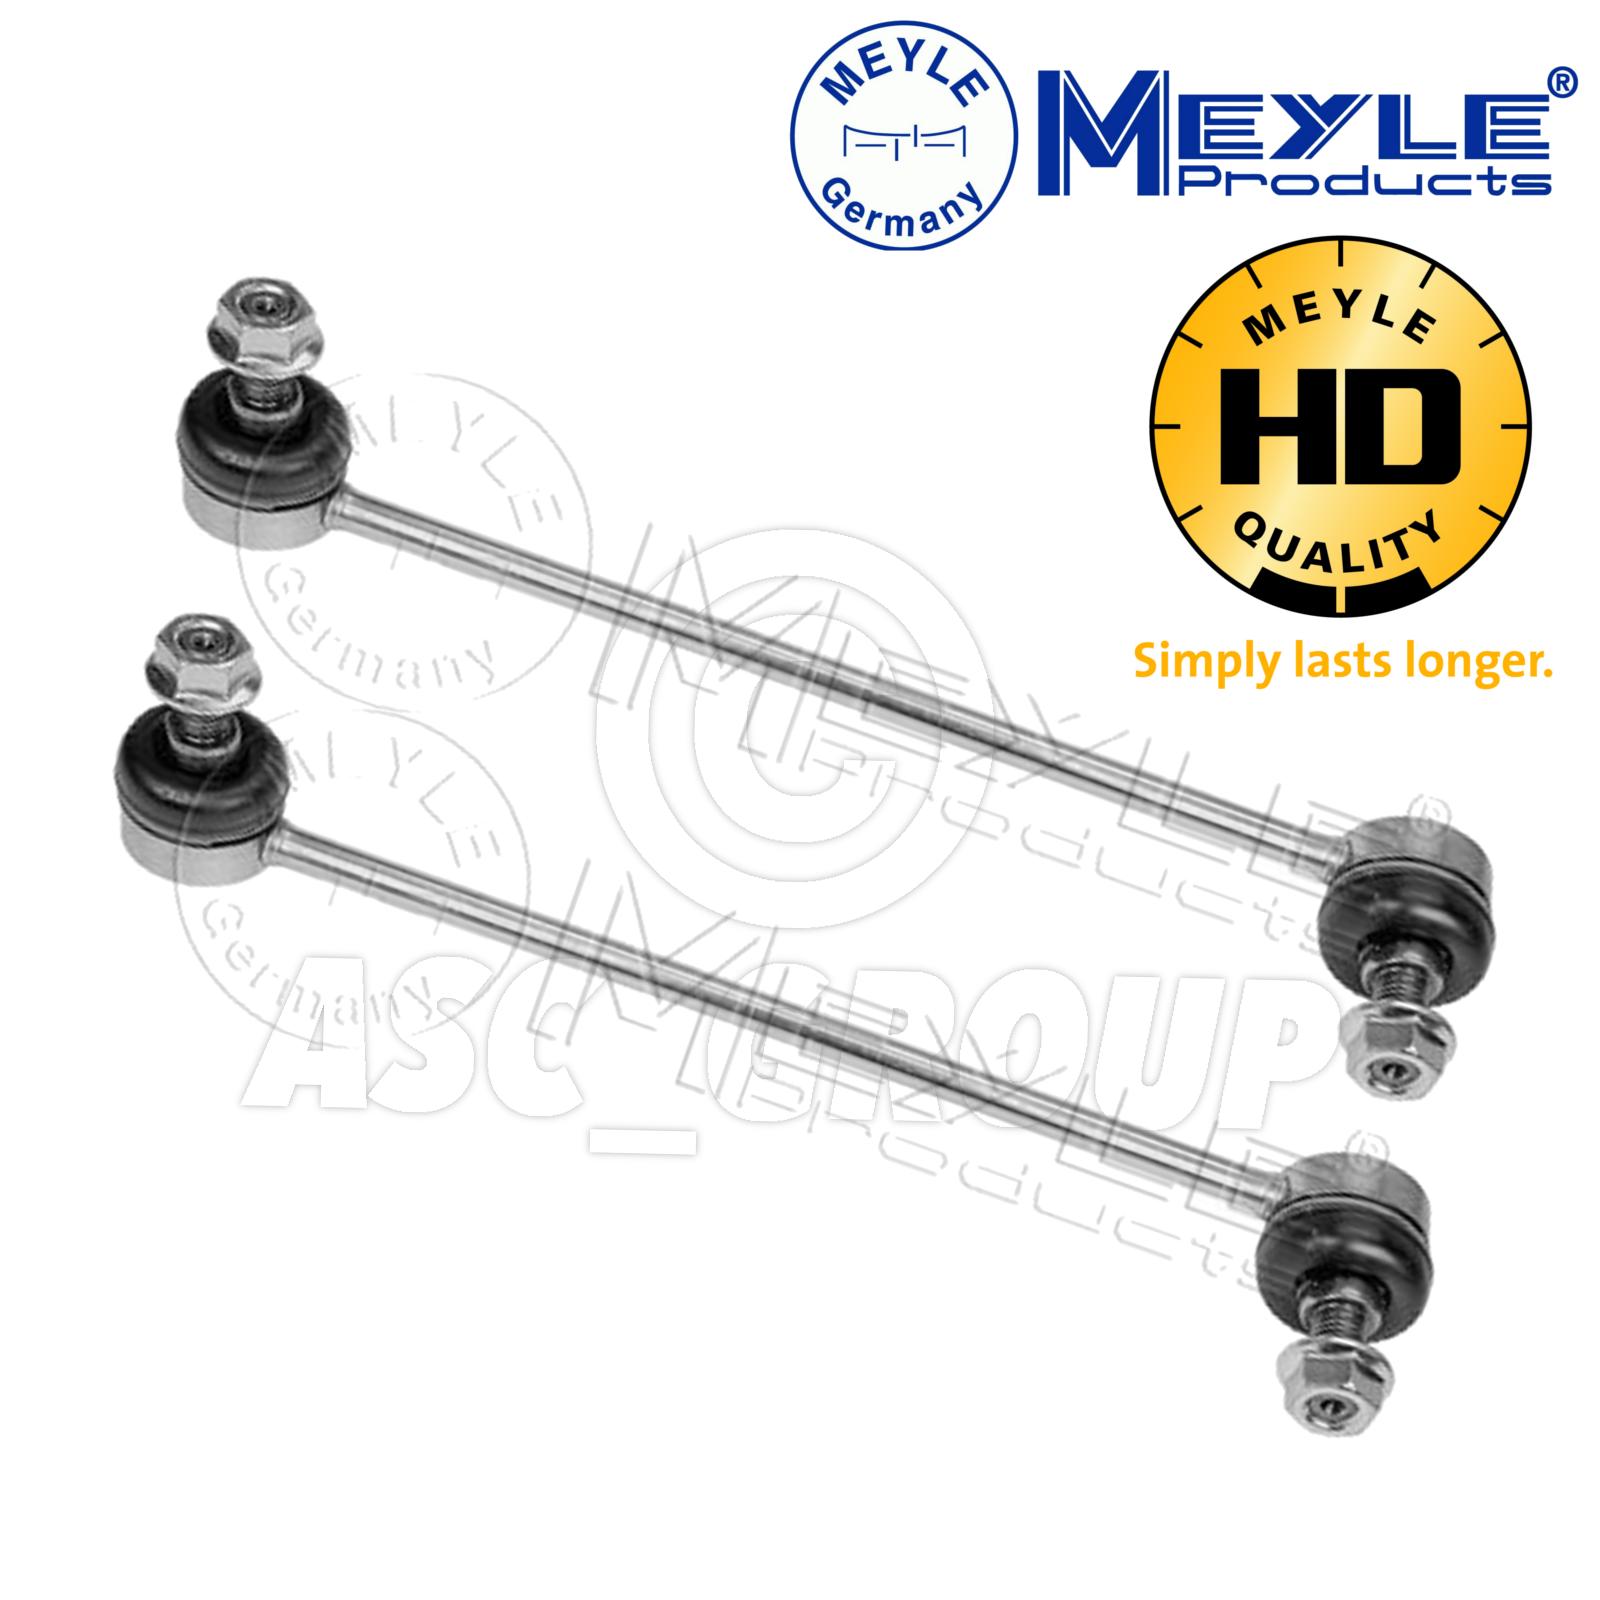 MEYLE Rear Left Stabiliser anti roll bar DROP LINK ROD Part No 516 060 0012//HD